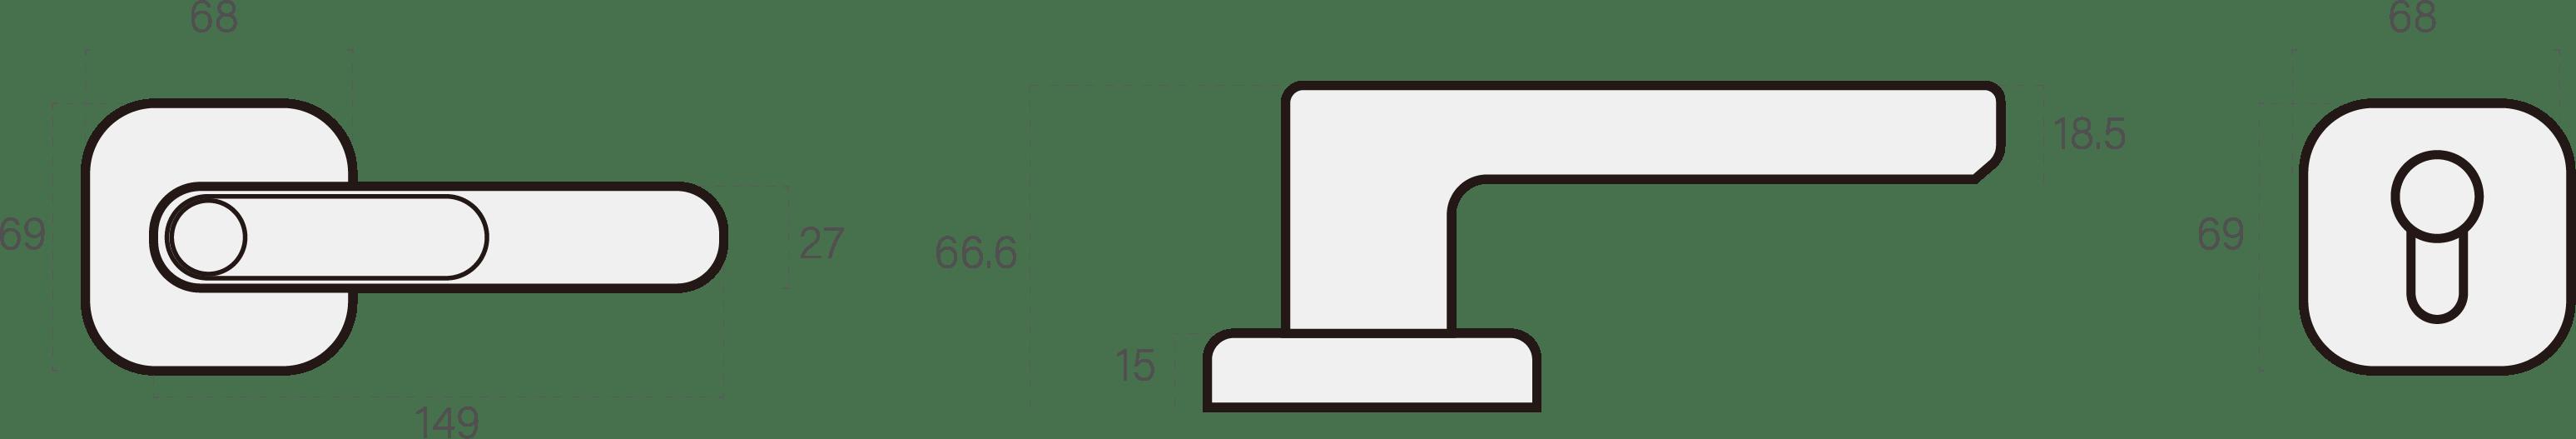 Sri Lanka Most Installed Digital Lock